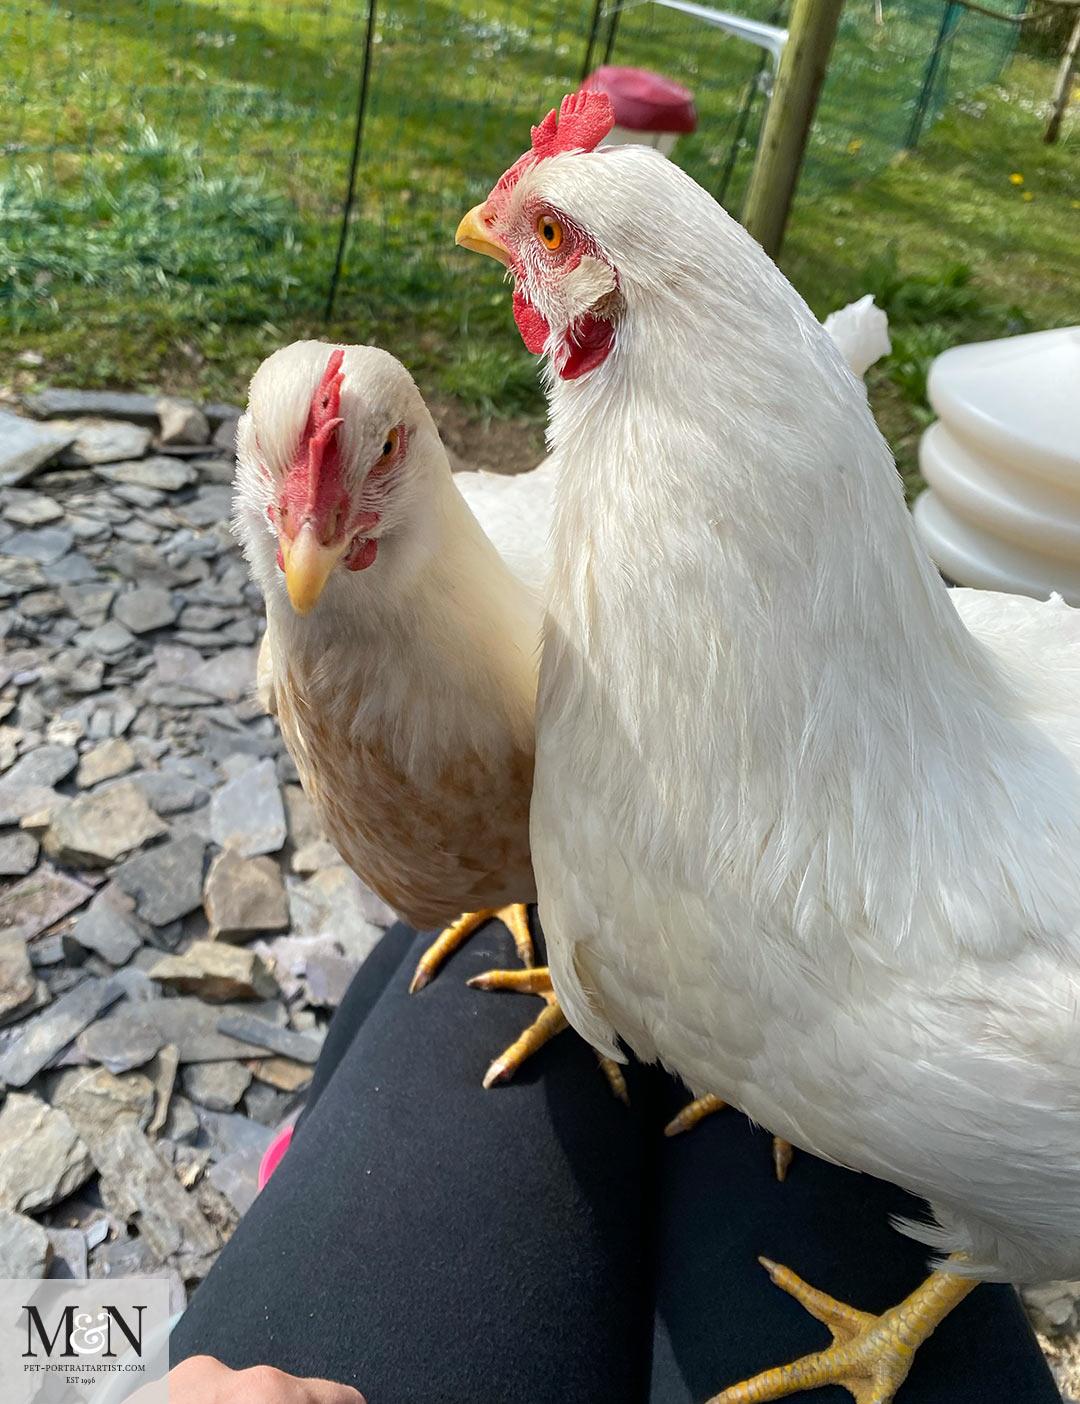 Melanie's April Monthly News - Chicken News